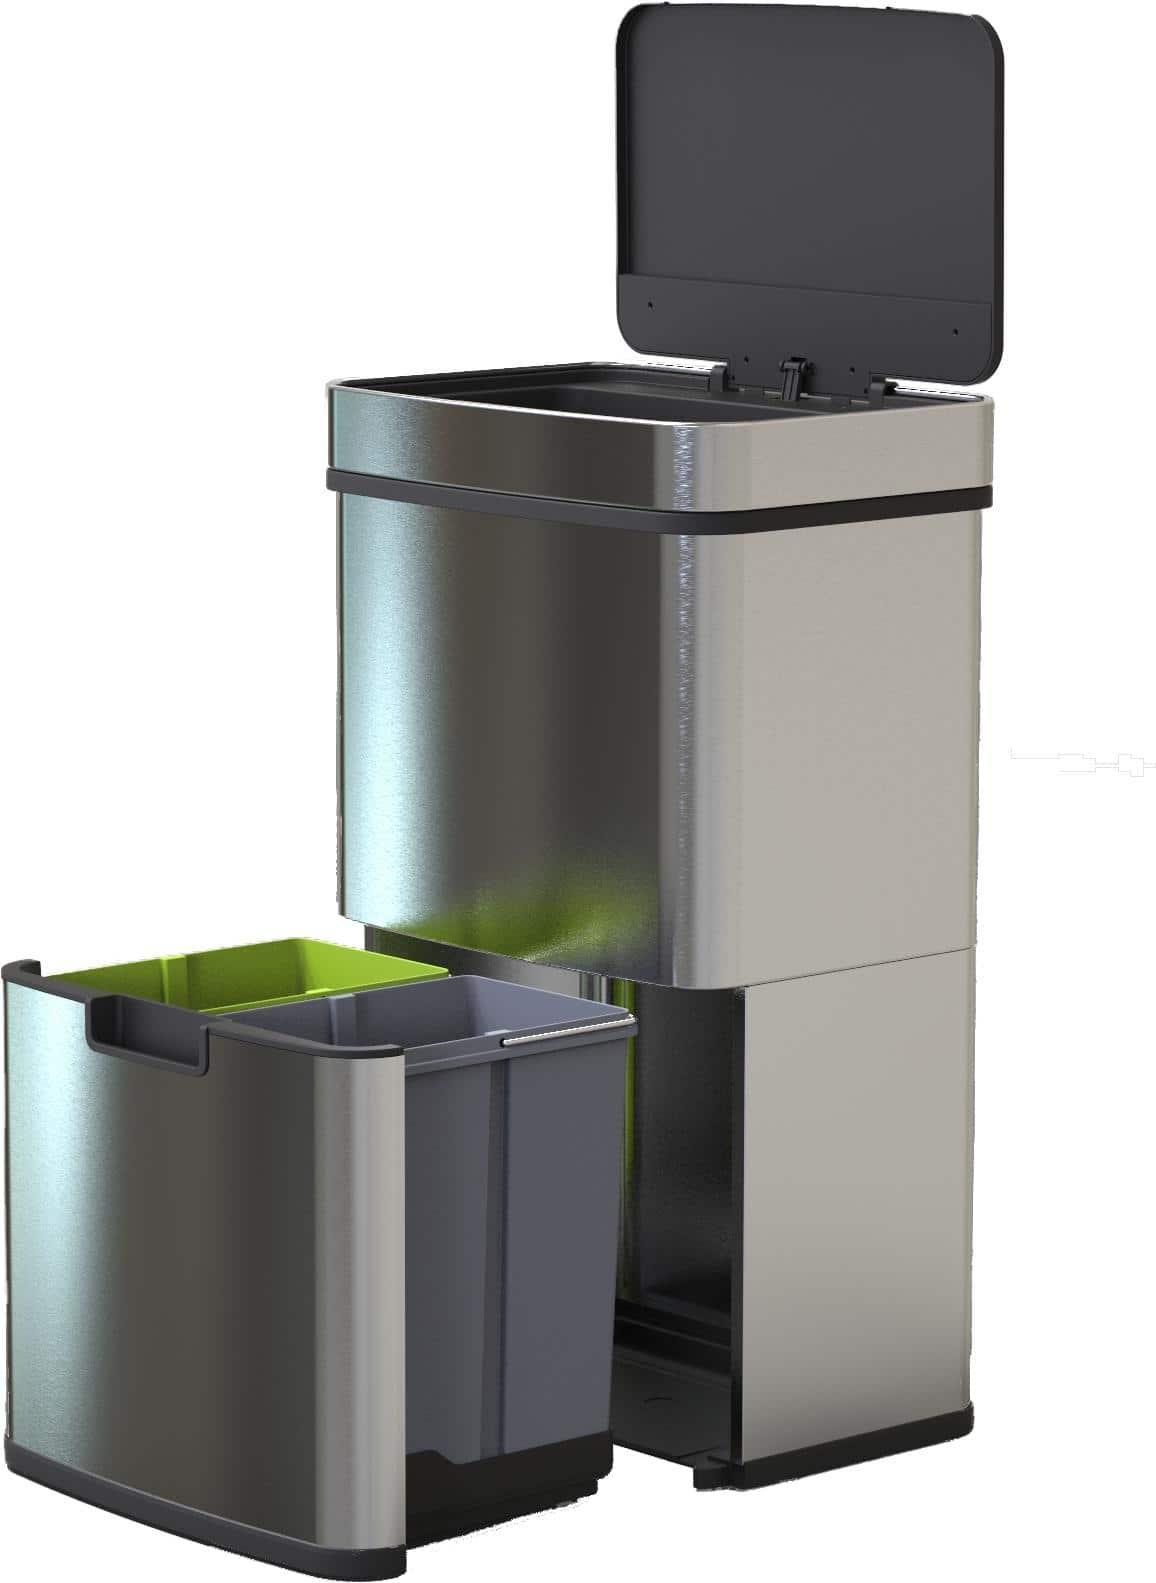 4cookz® Smart Waste RVS afvalscheidingsprullenbak met sensor – 72 liter